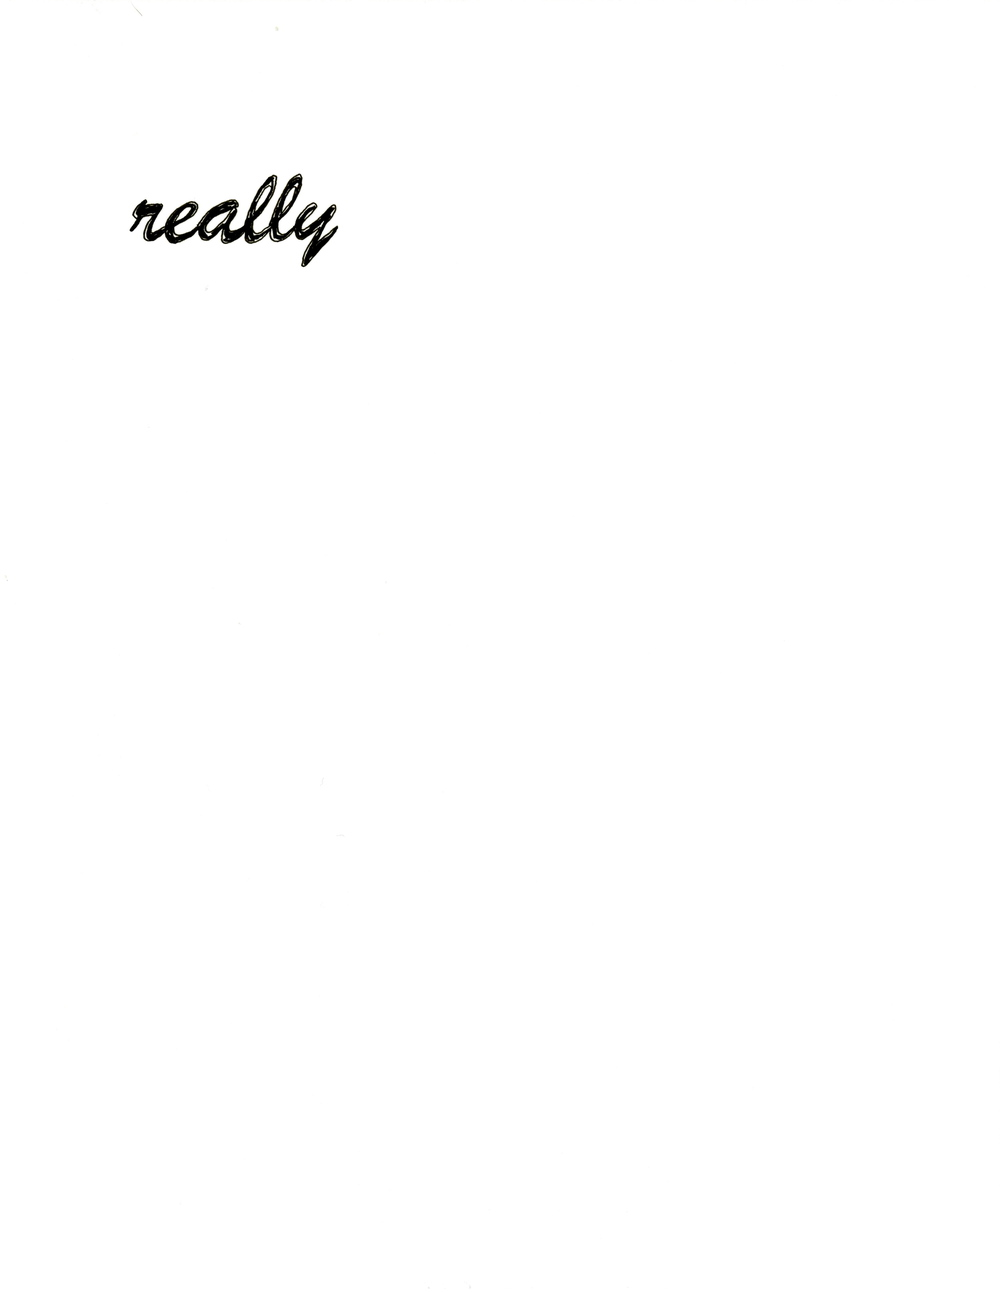 Ecstasy Text011.jpg